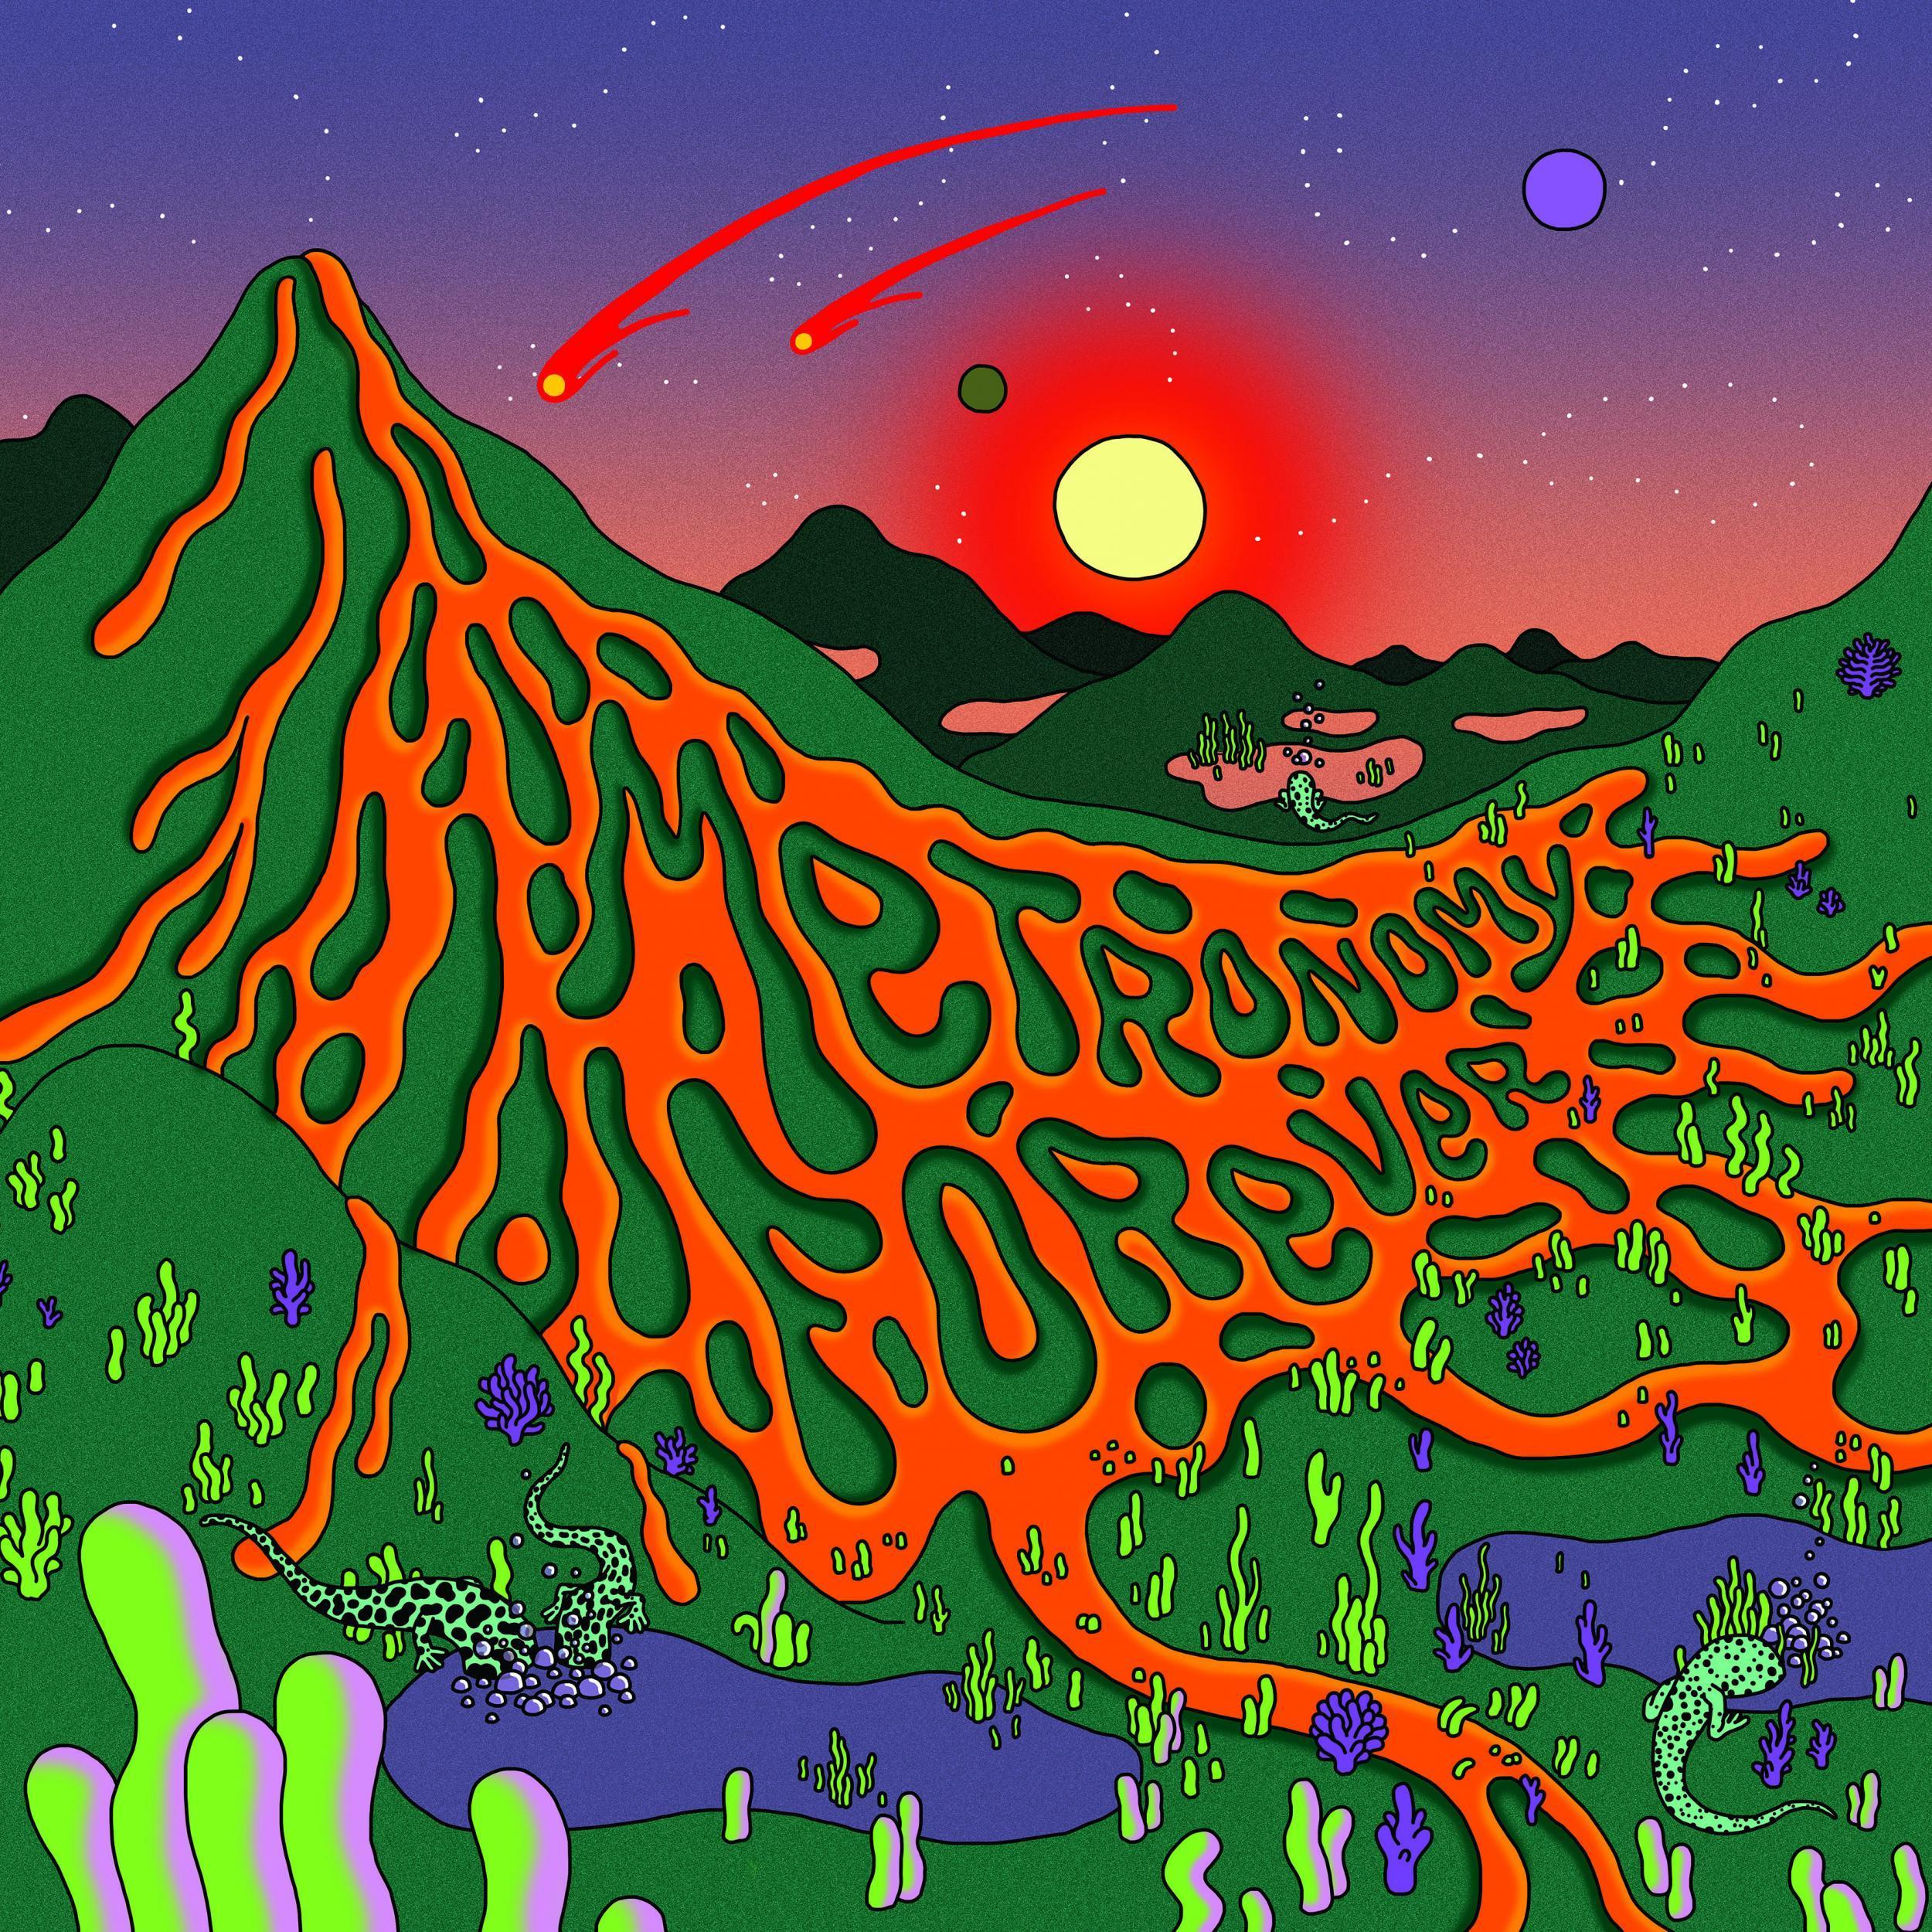 Metronomy's Joe Mount: 'I'm jealous of bands who get played